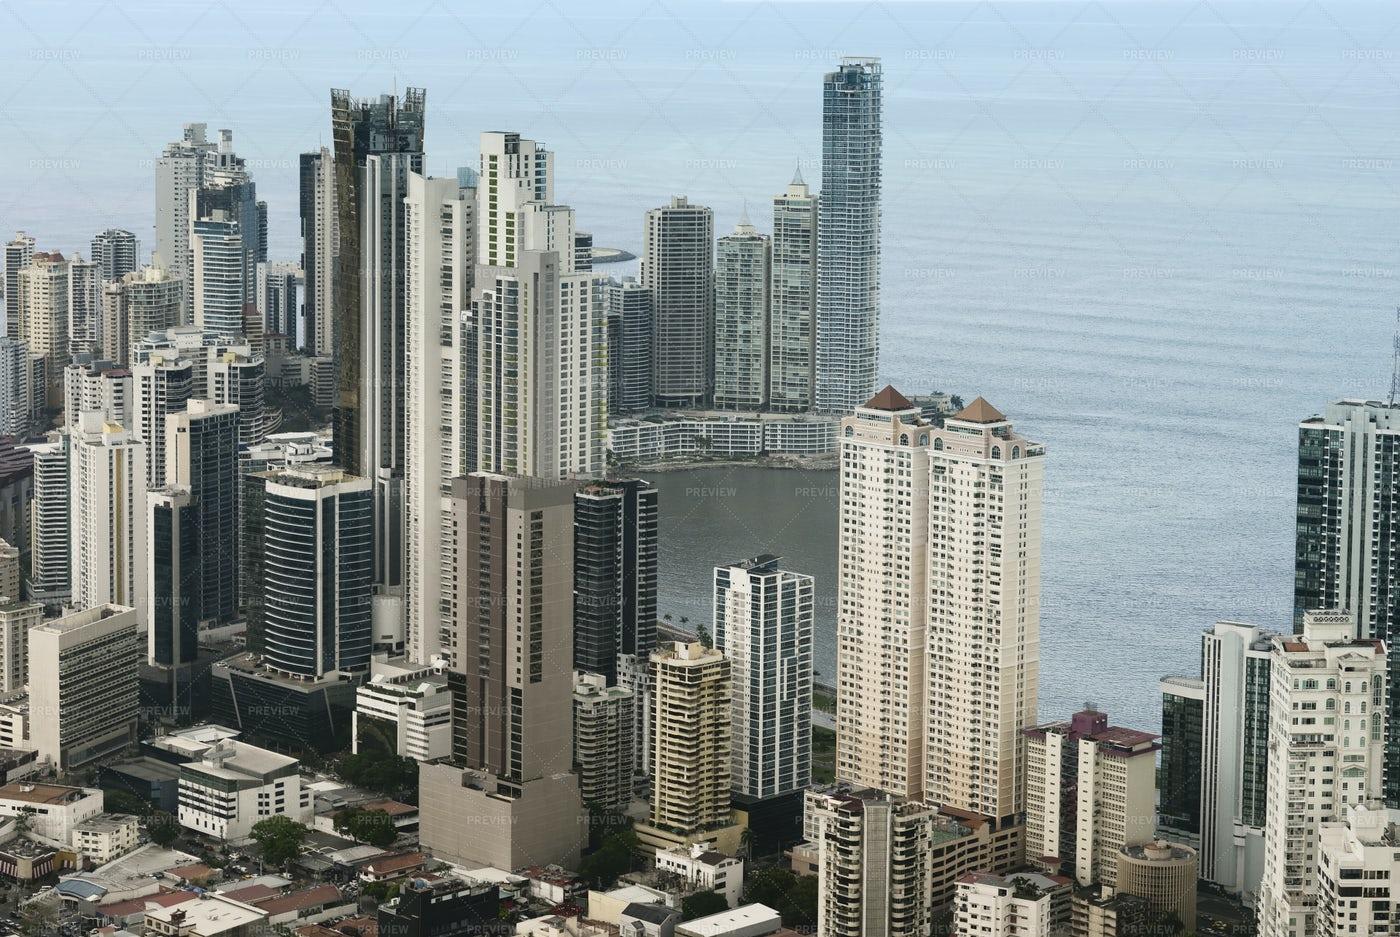 Panama City Skyscrapers: Stock Photos